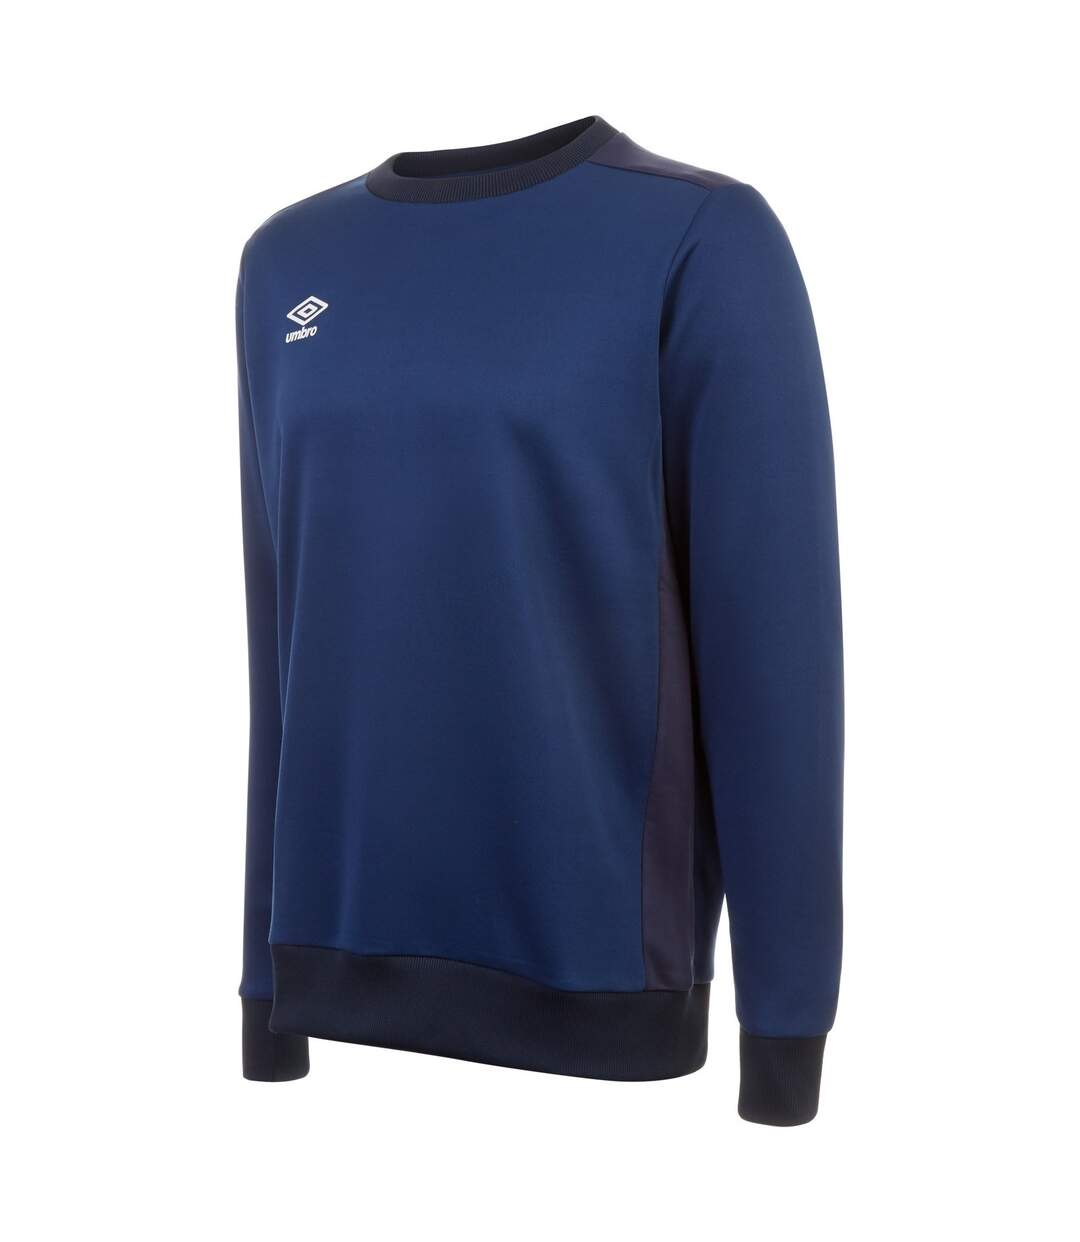 Umbro Mens Fleece Training Sweatshirt (Navy/Dark Navy) - UTGD105